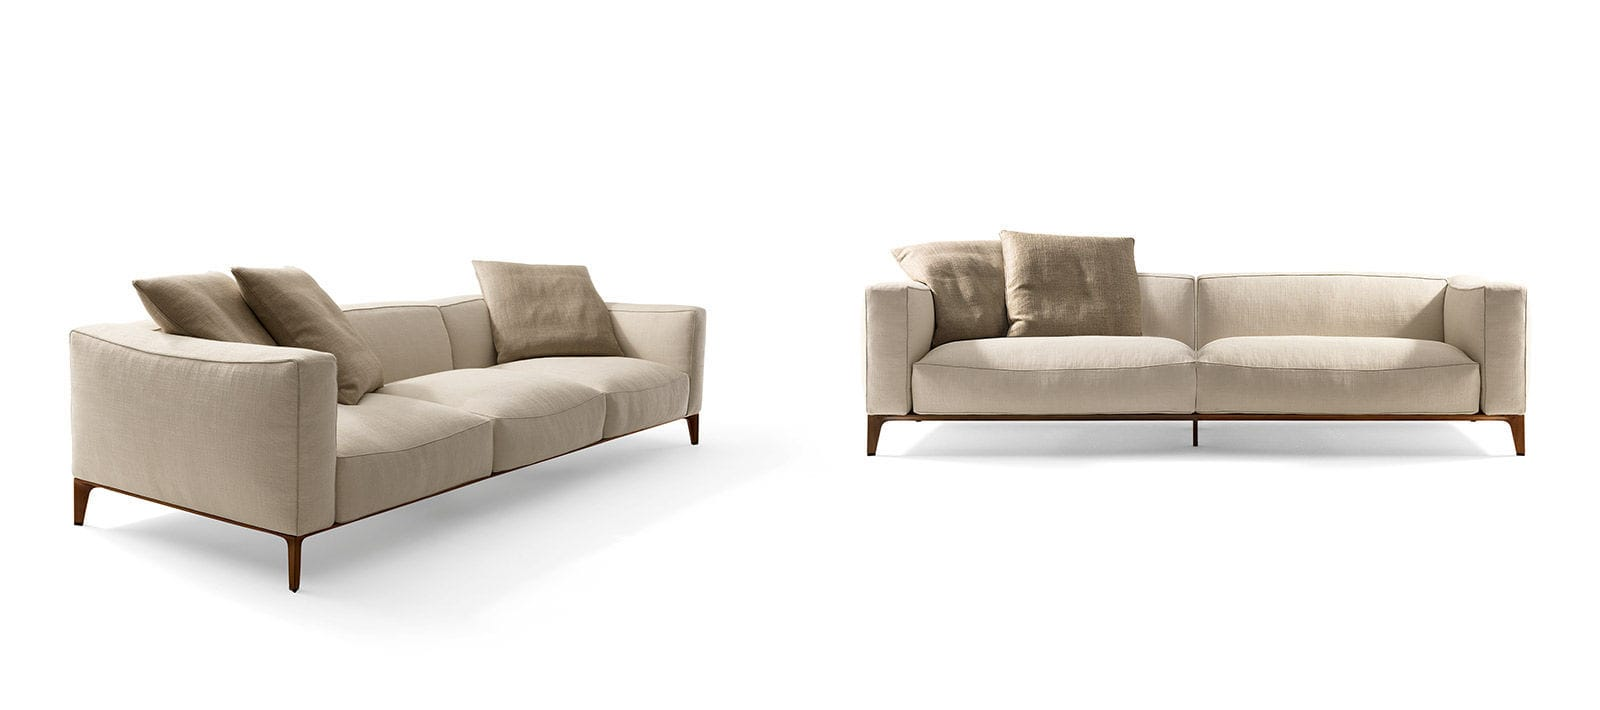 Modular Sofa Contemporary Fabric Leather